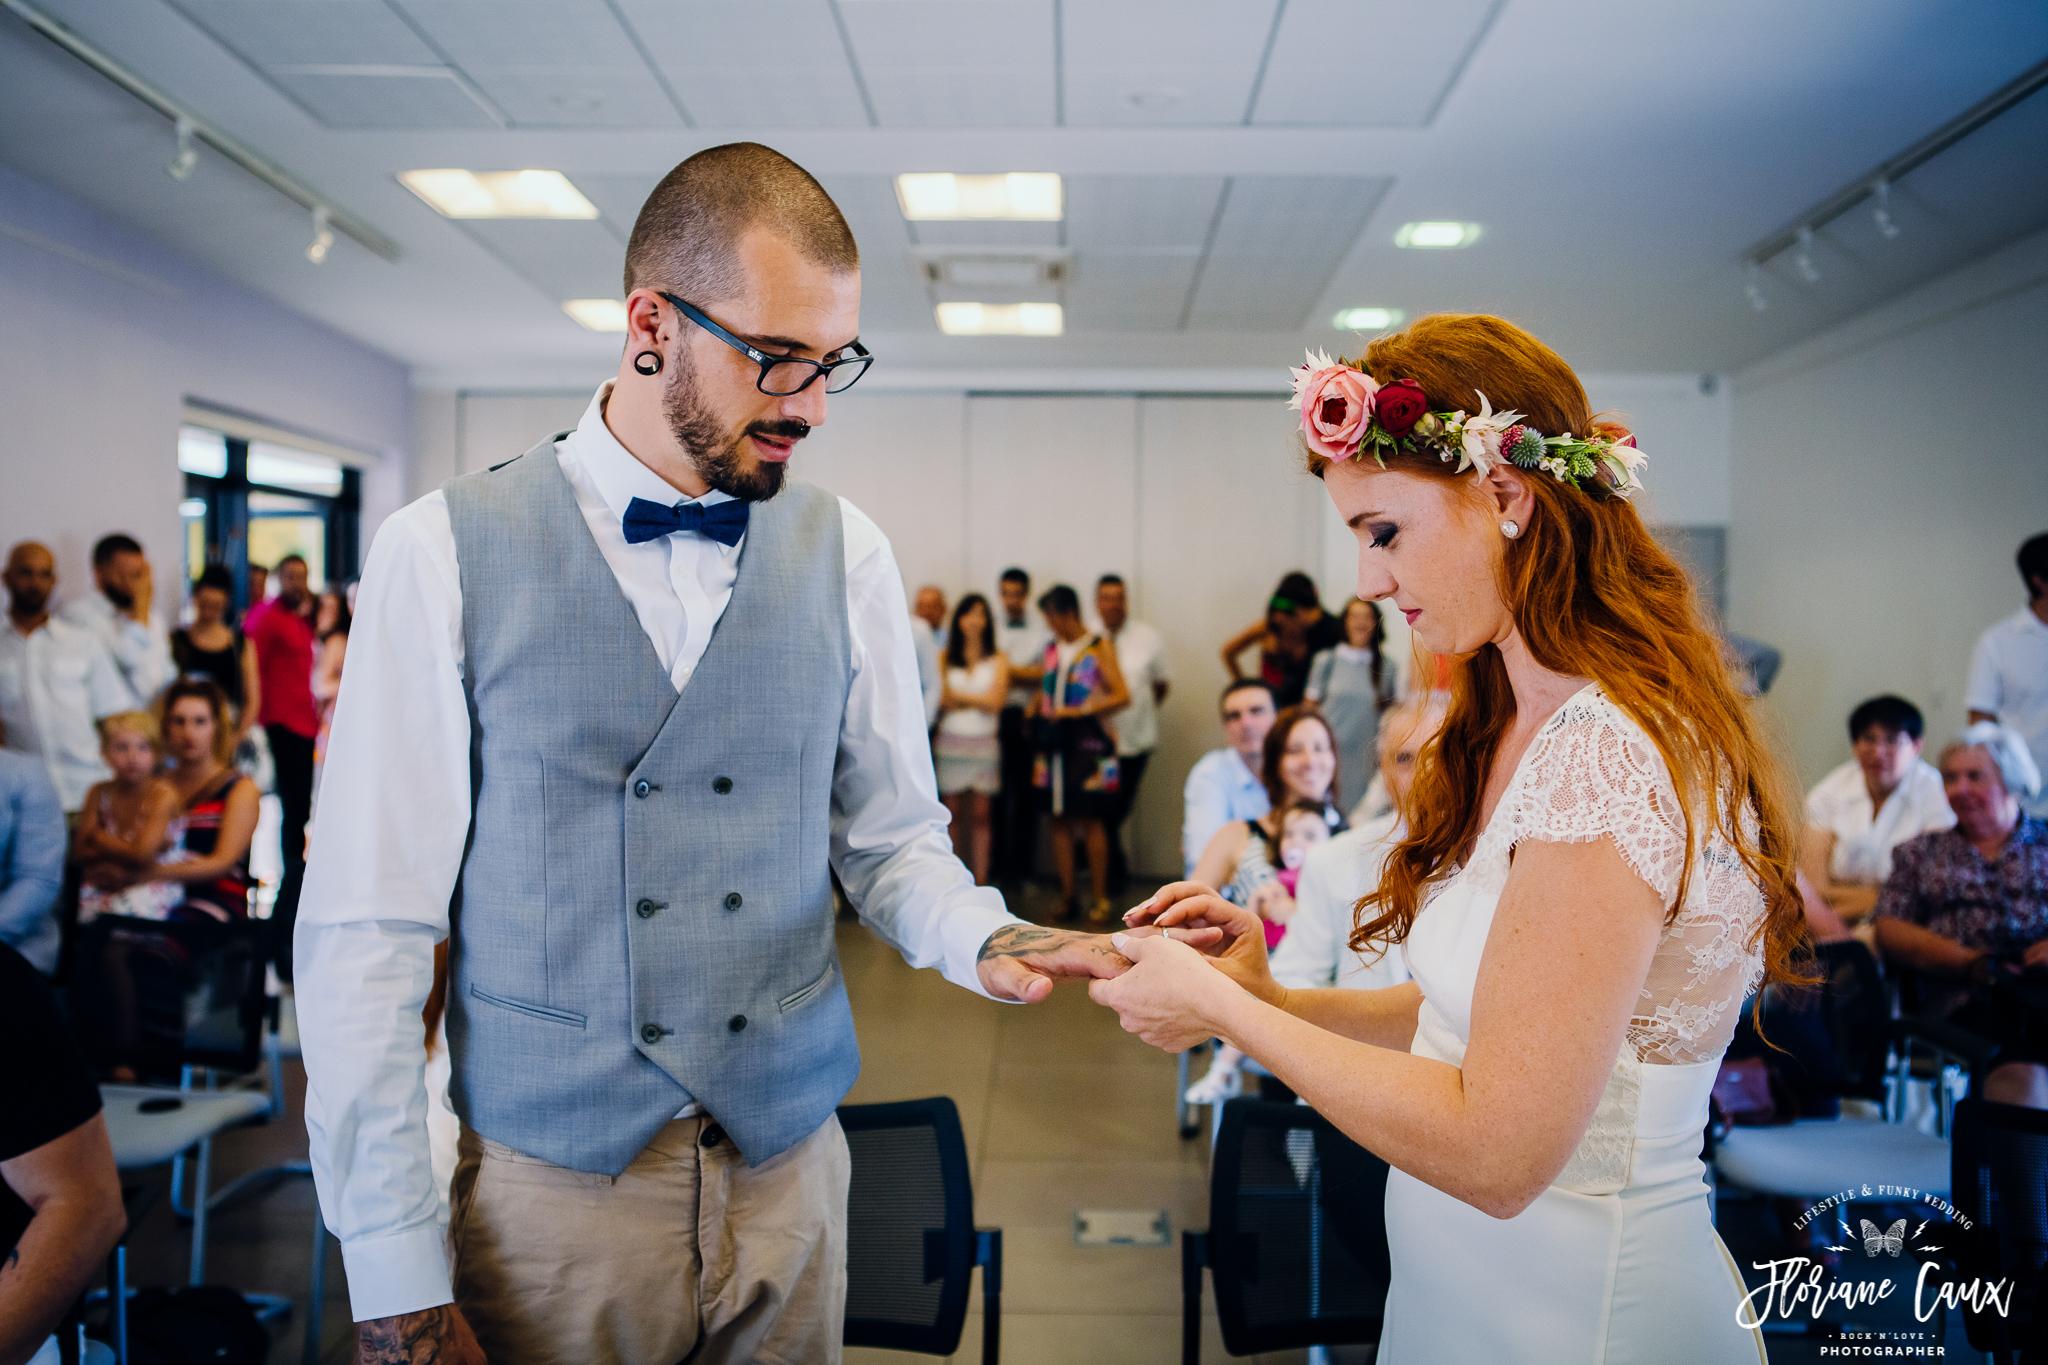 photographe-mariage-toulouse-rocknroll-maries-tatoues-floriane-caux-36